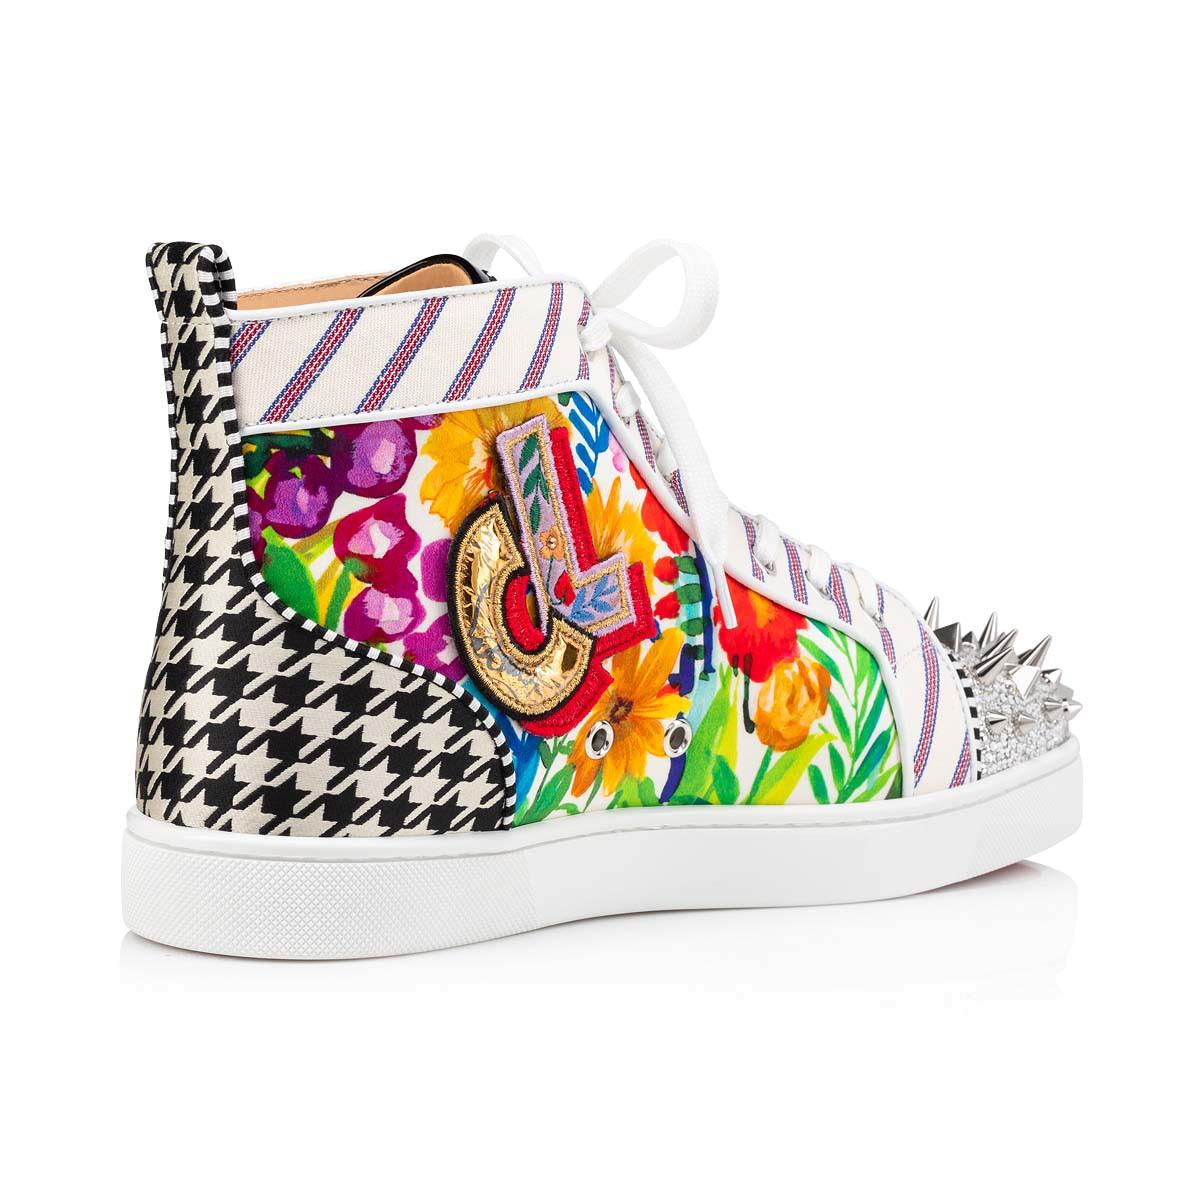 Shoes - No Limit Caracaba Flat - Christian Louboutin